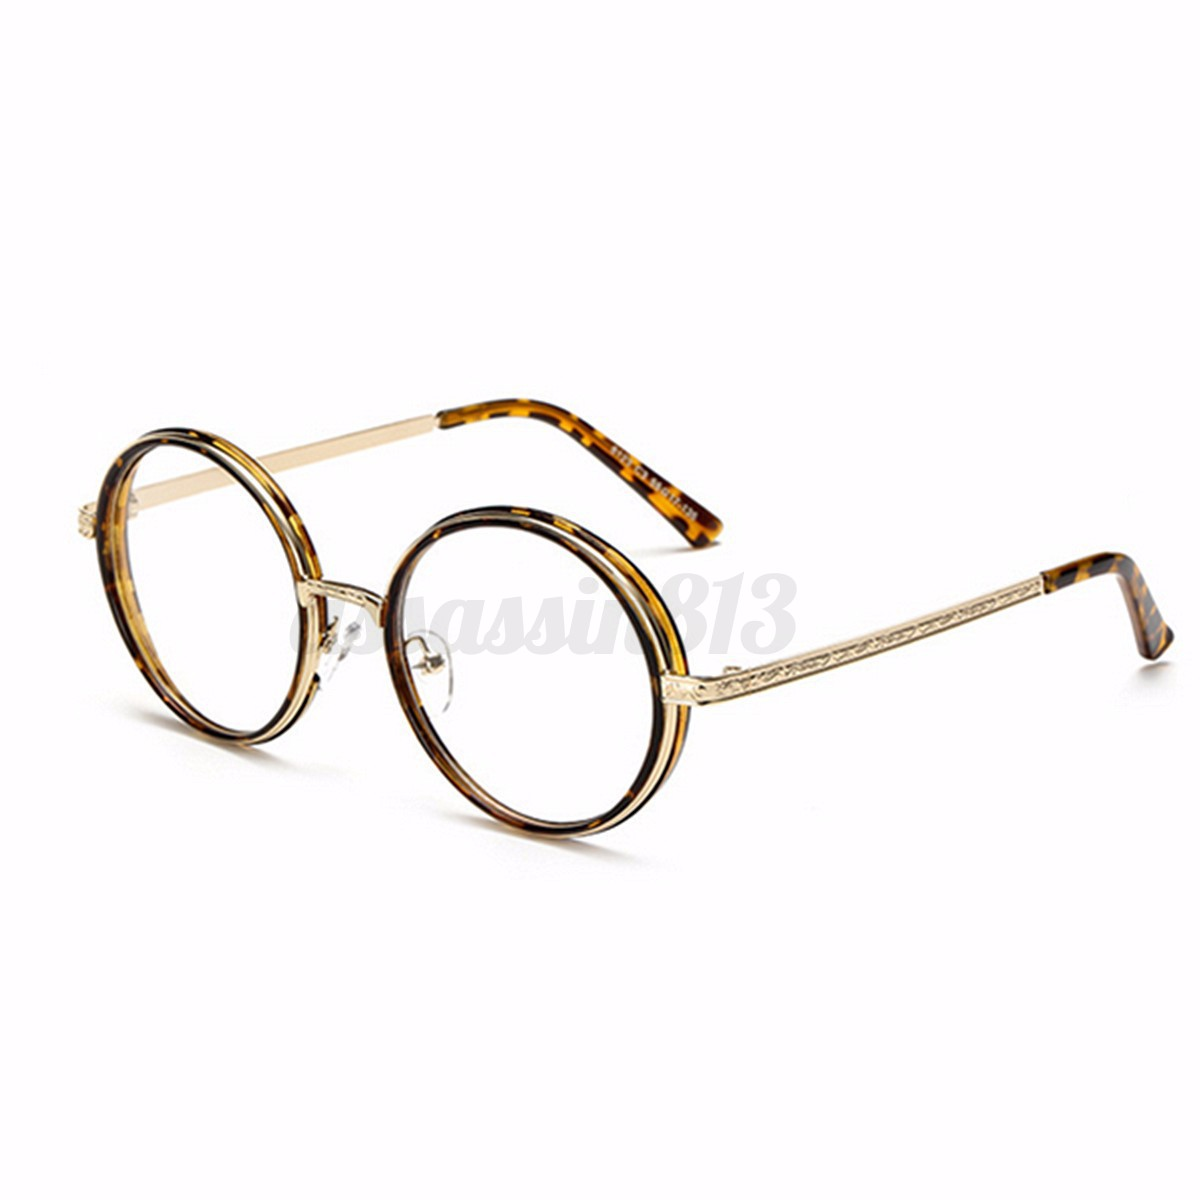 Unisex Vintage Round Tortoise Full Rim Eyeglasses Frame ...